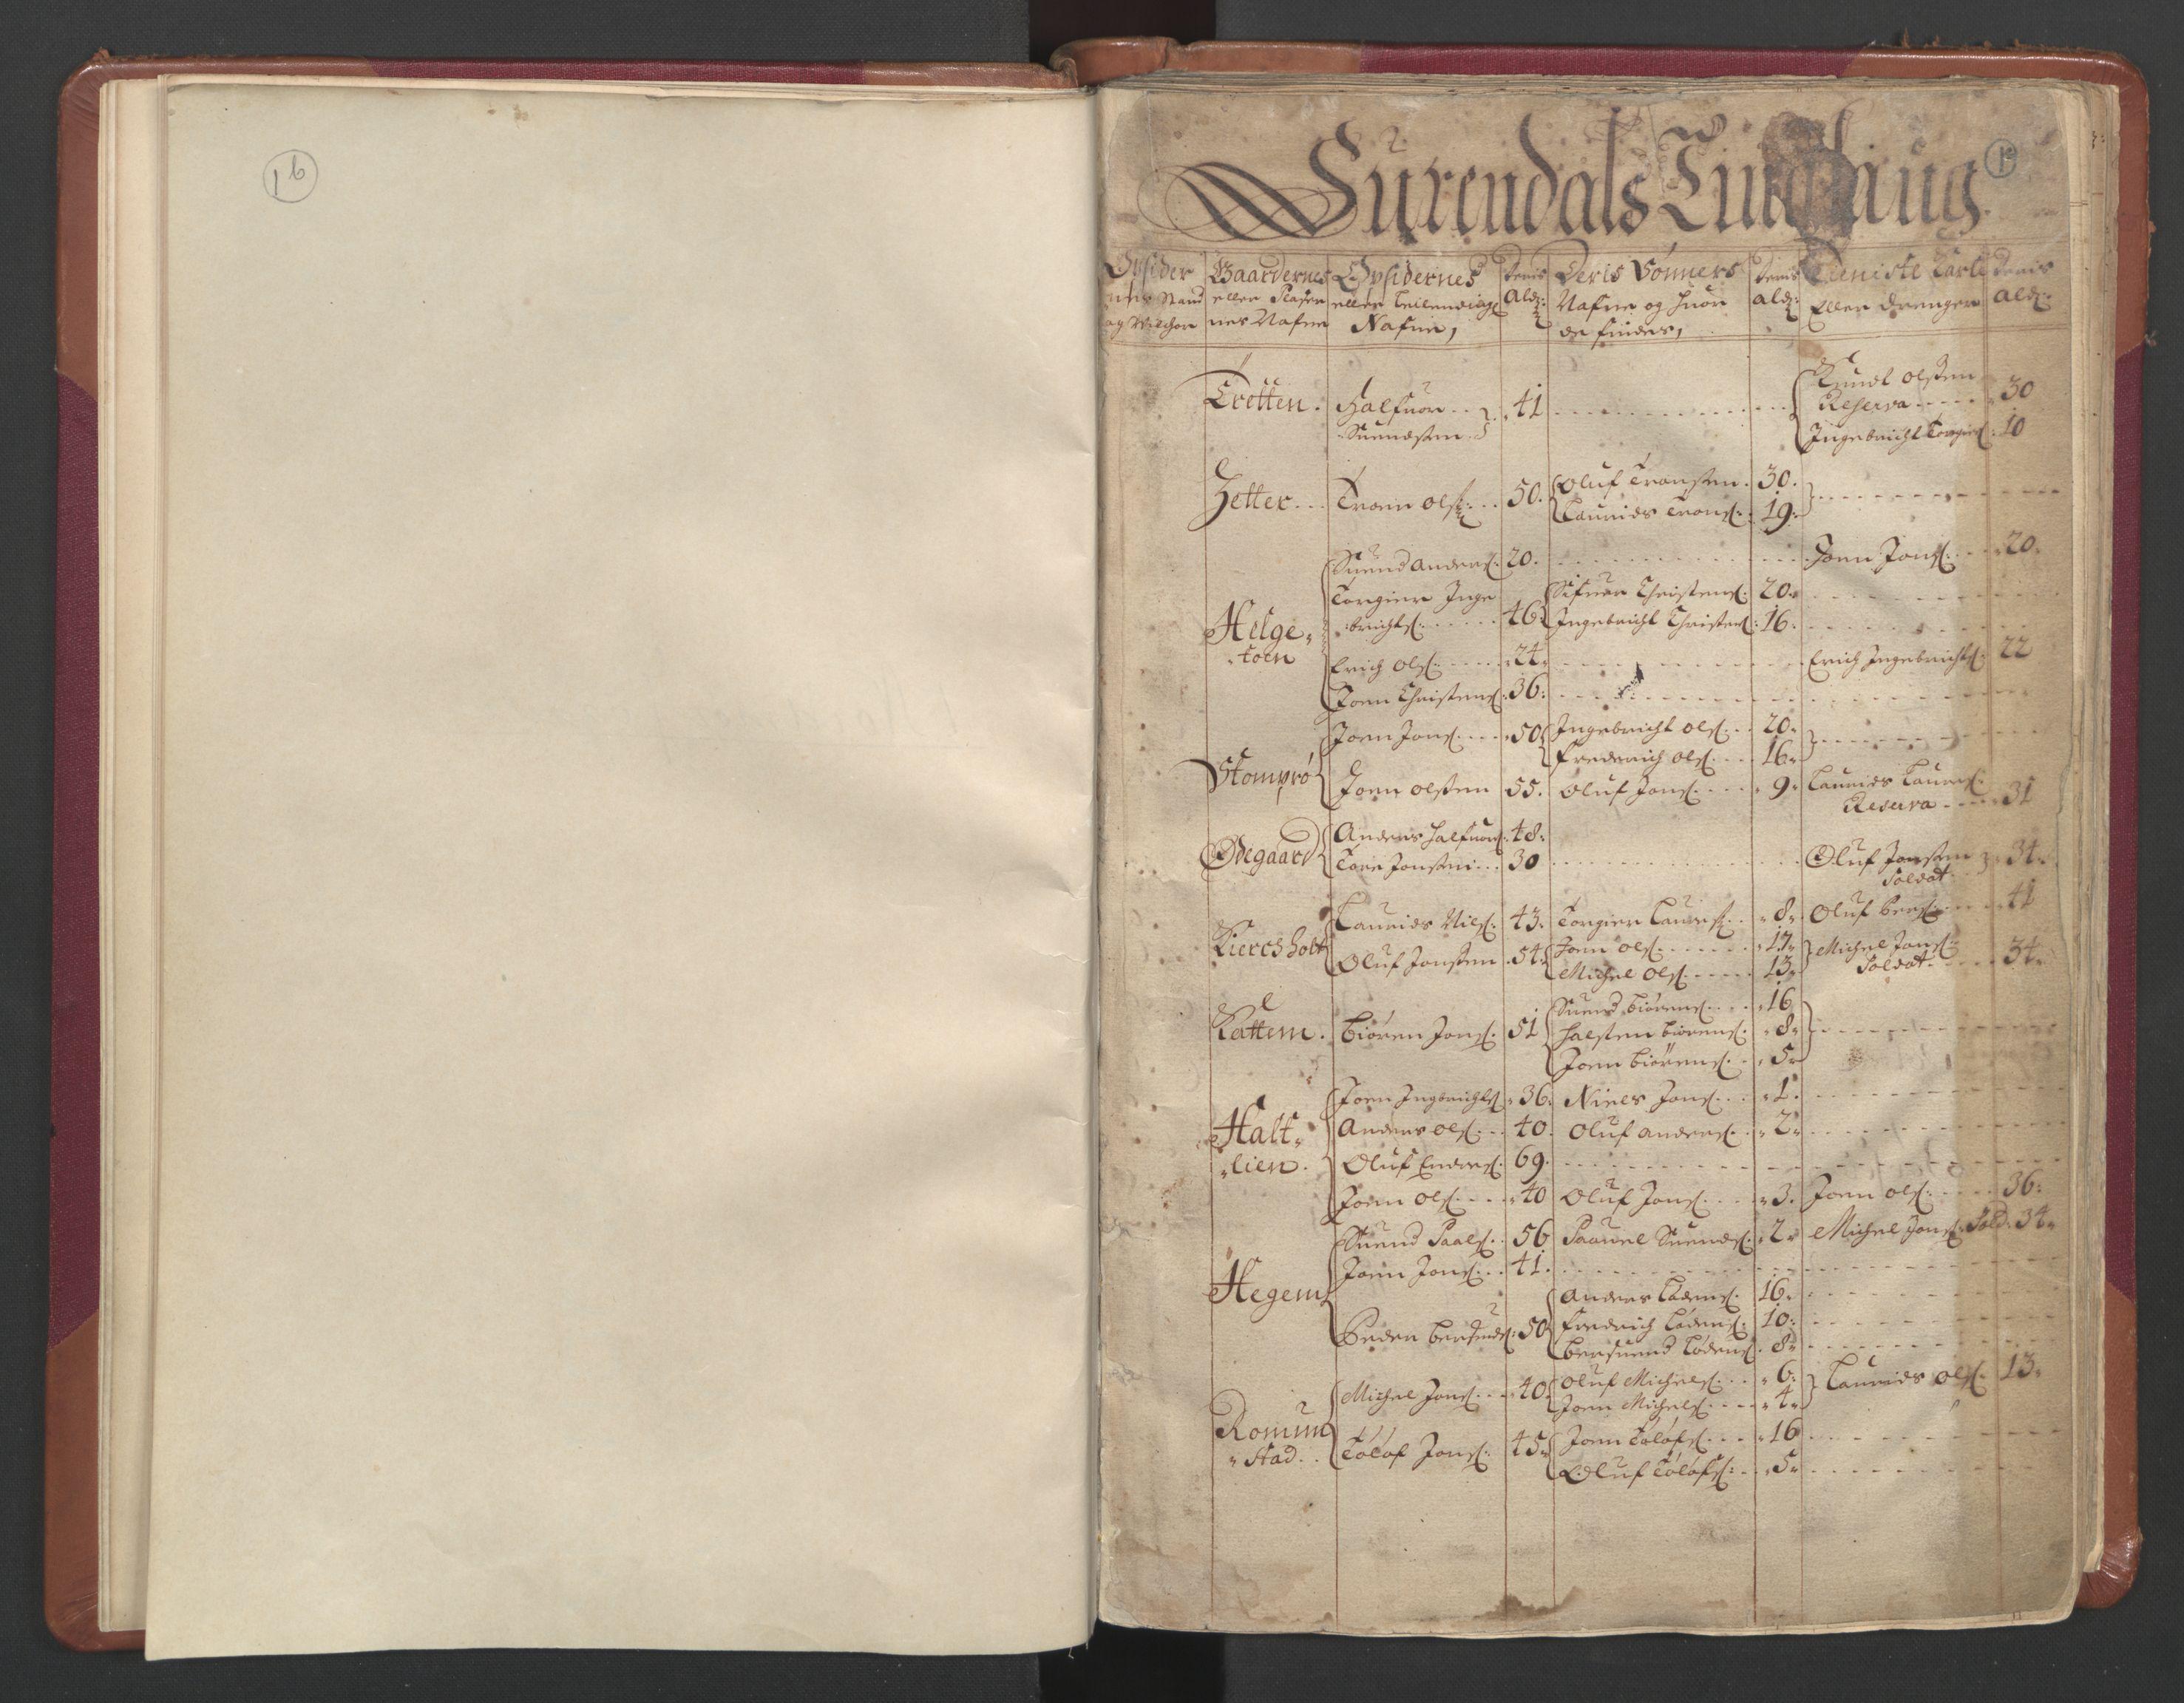 RA, Manntallet 1701, nr. 11: Nordmøre fogderi og Romsdal fogderi, 1701, s. 1b-1c